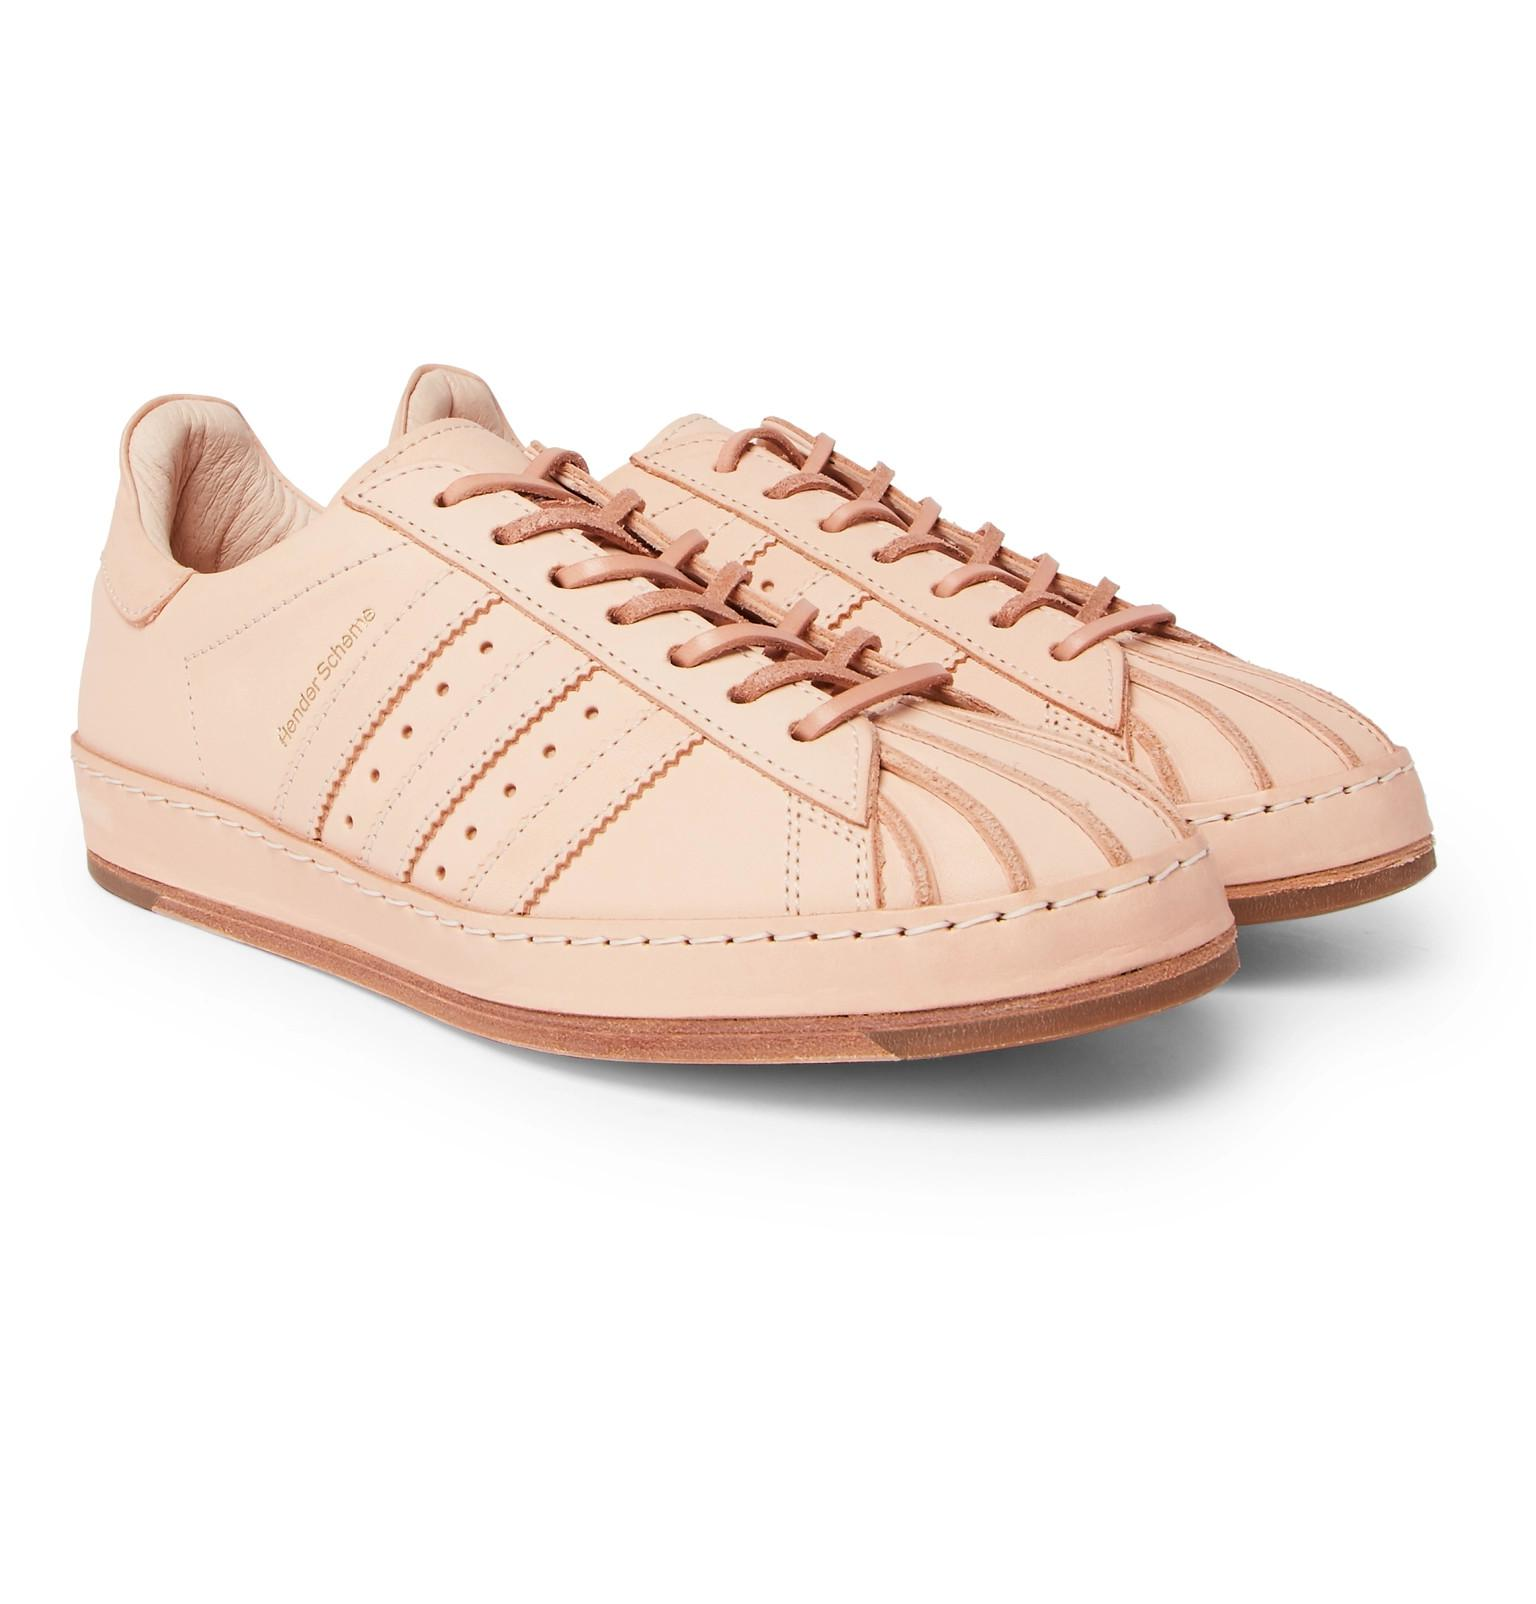 + Hender Scheme Superstar Leather Sneakers adidas Consortium HVaviLmep